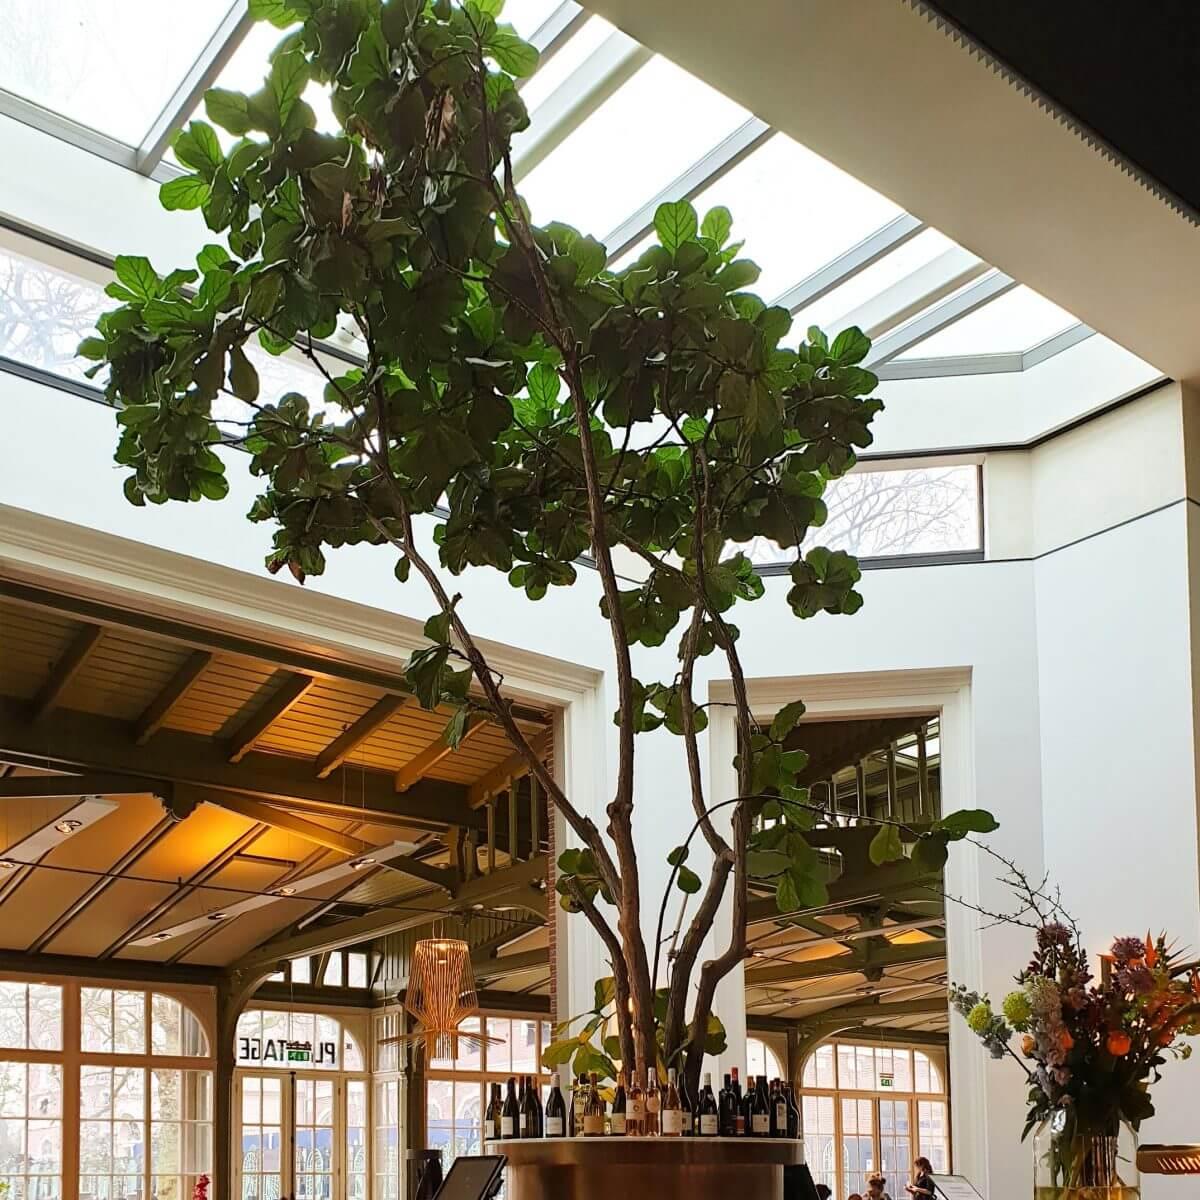 de vijgenboom in De Plantage